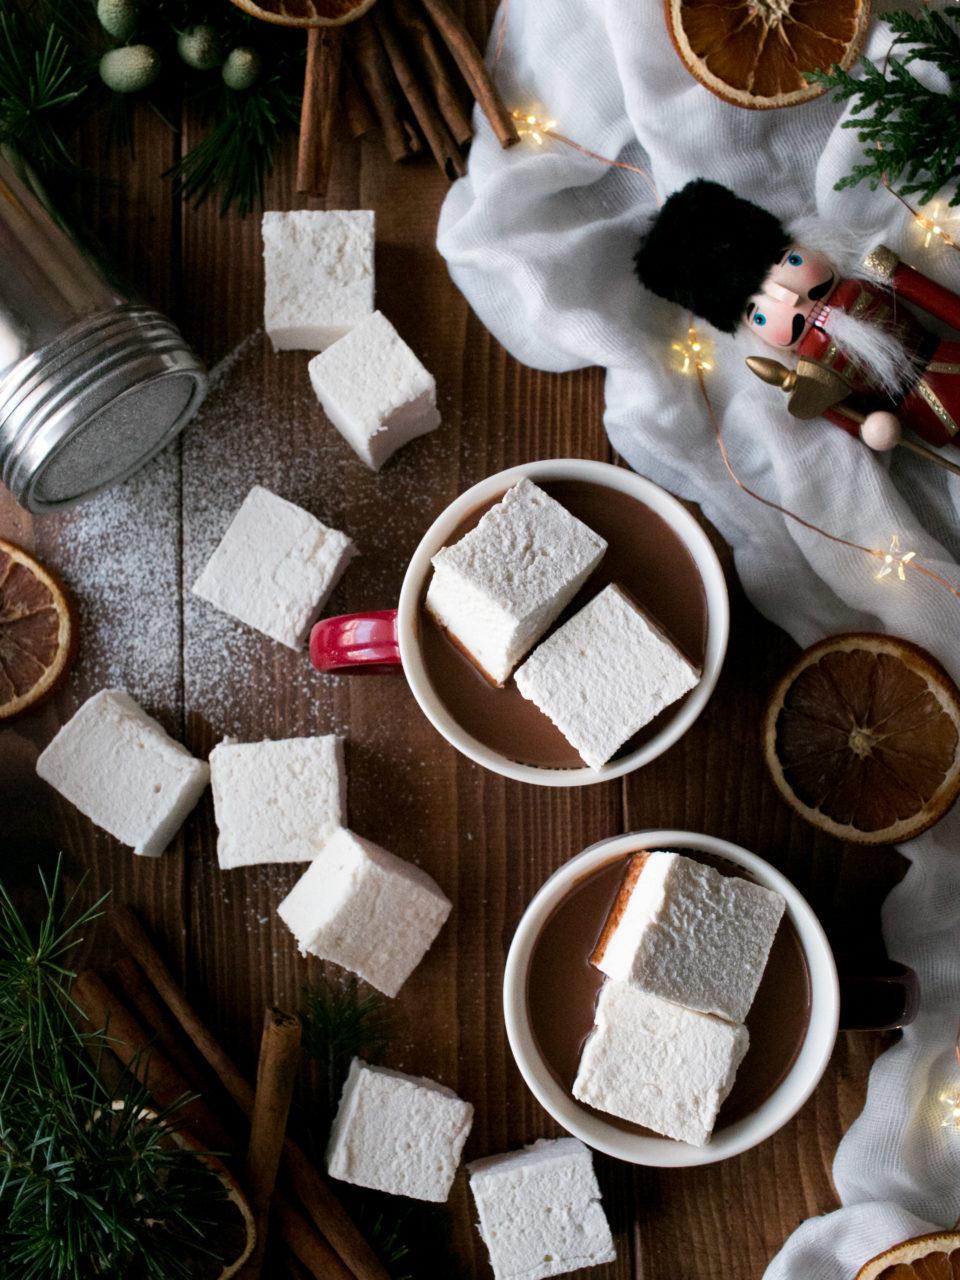 Nubes o malvaviscos caseros | Homemade marshmallows